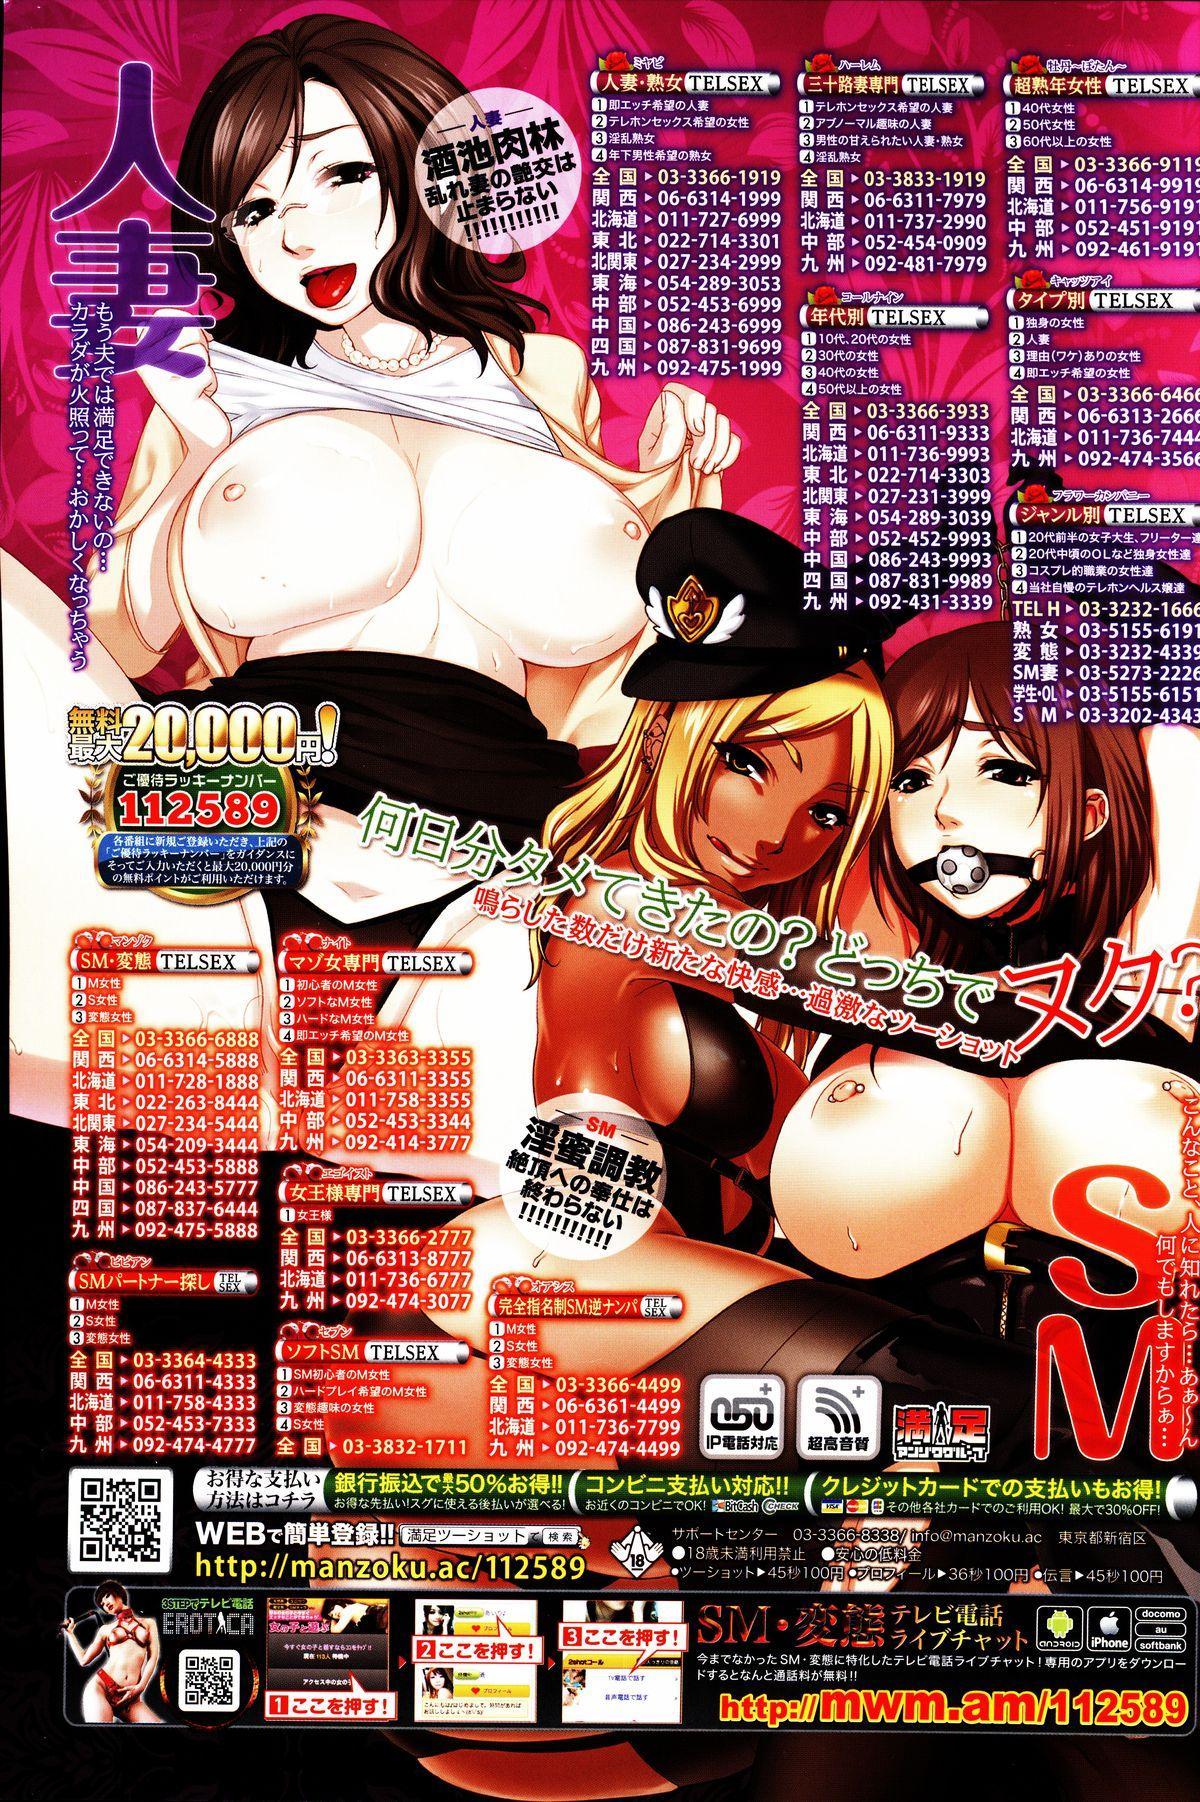 Girls forM Vol. 09 420